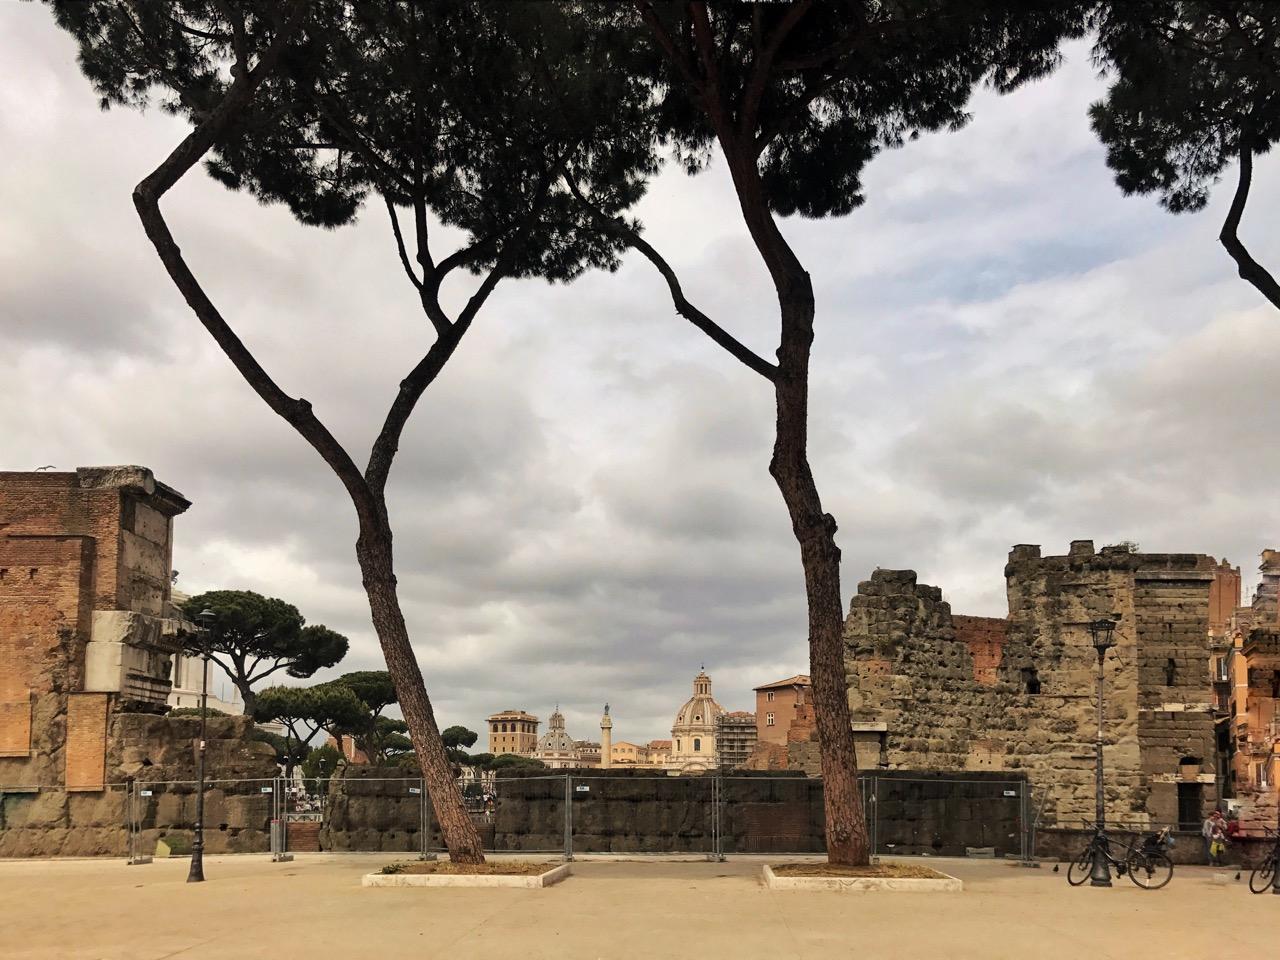 Cloudy skies and Roman ruins